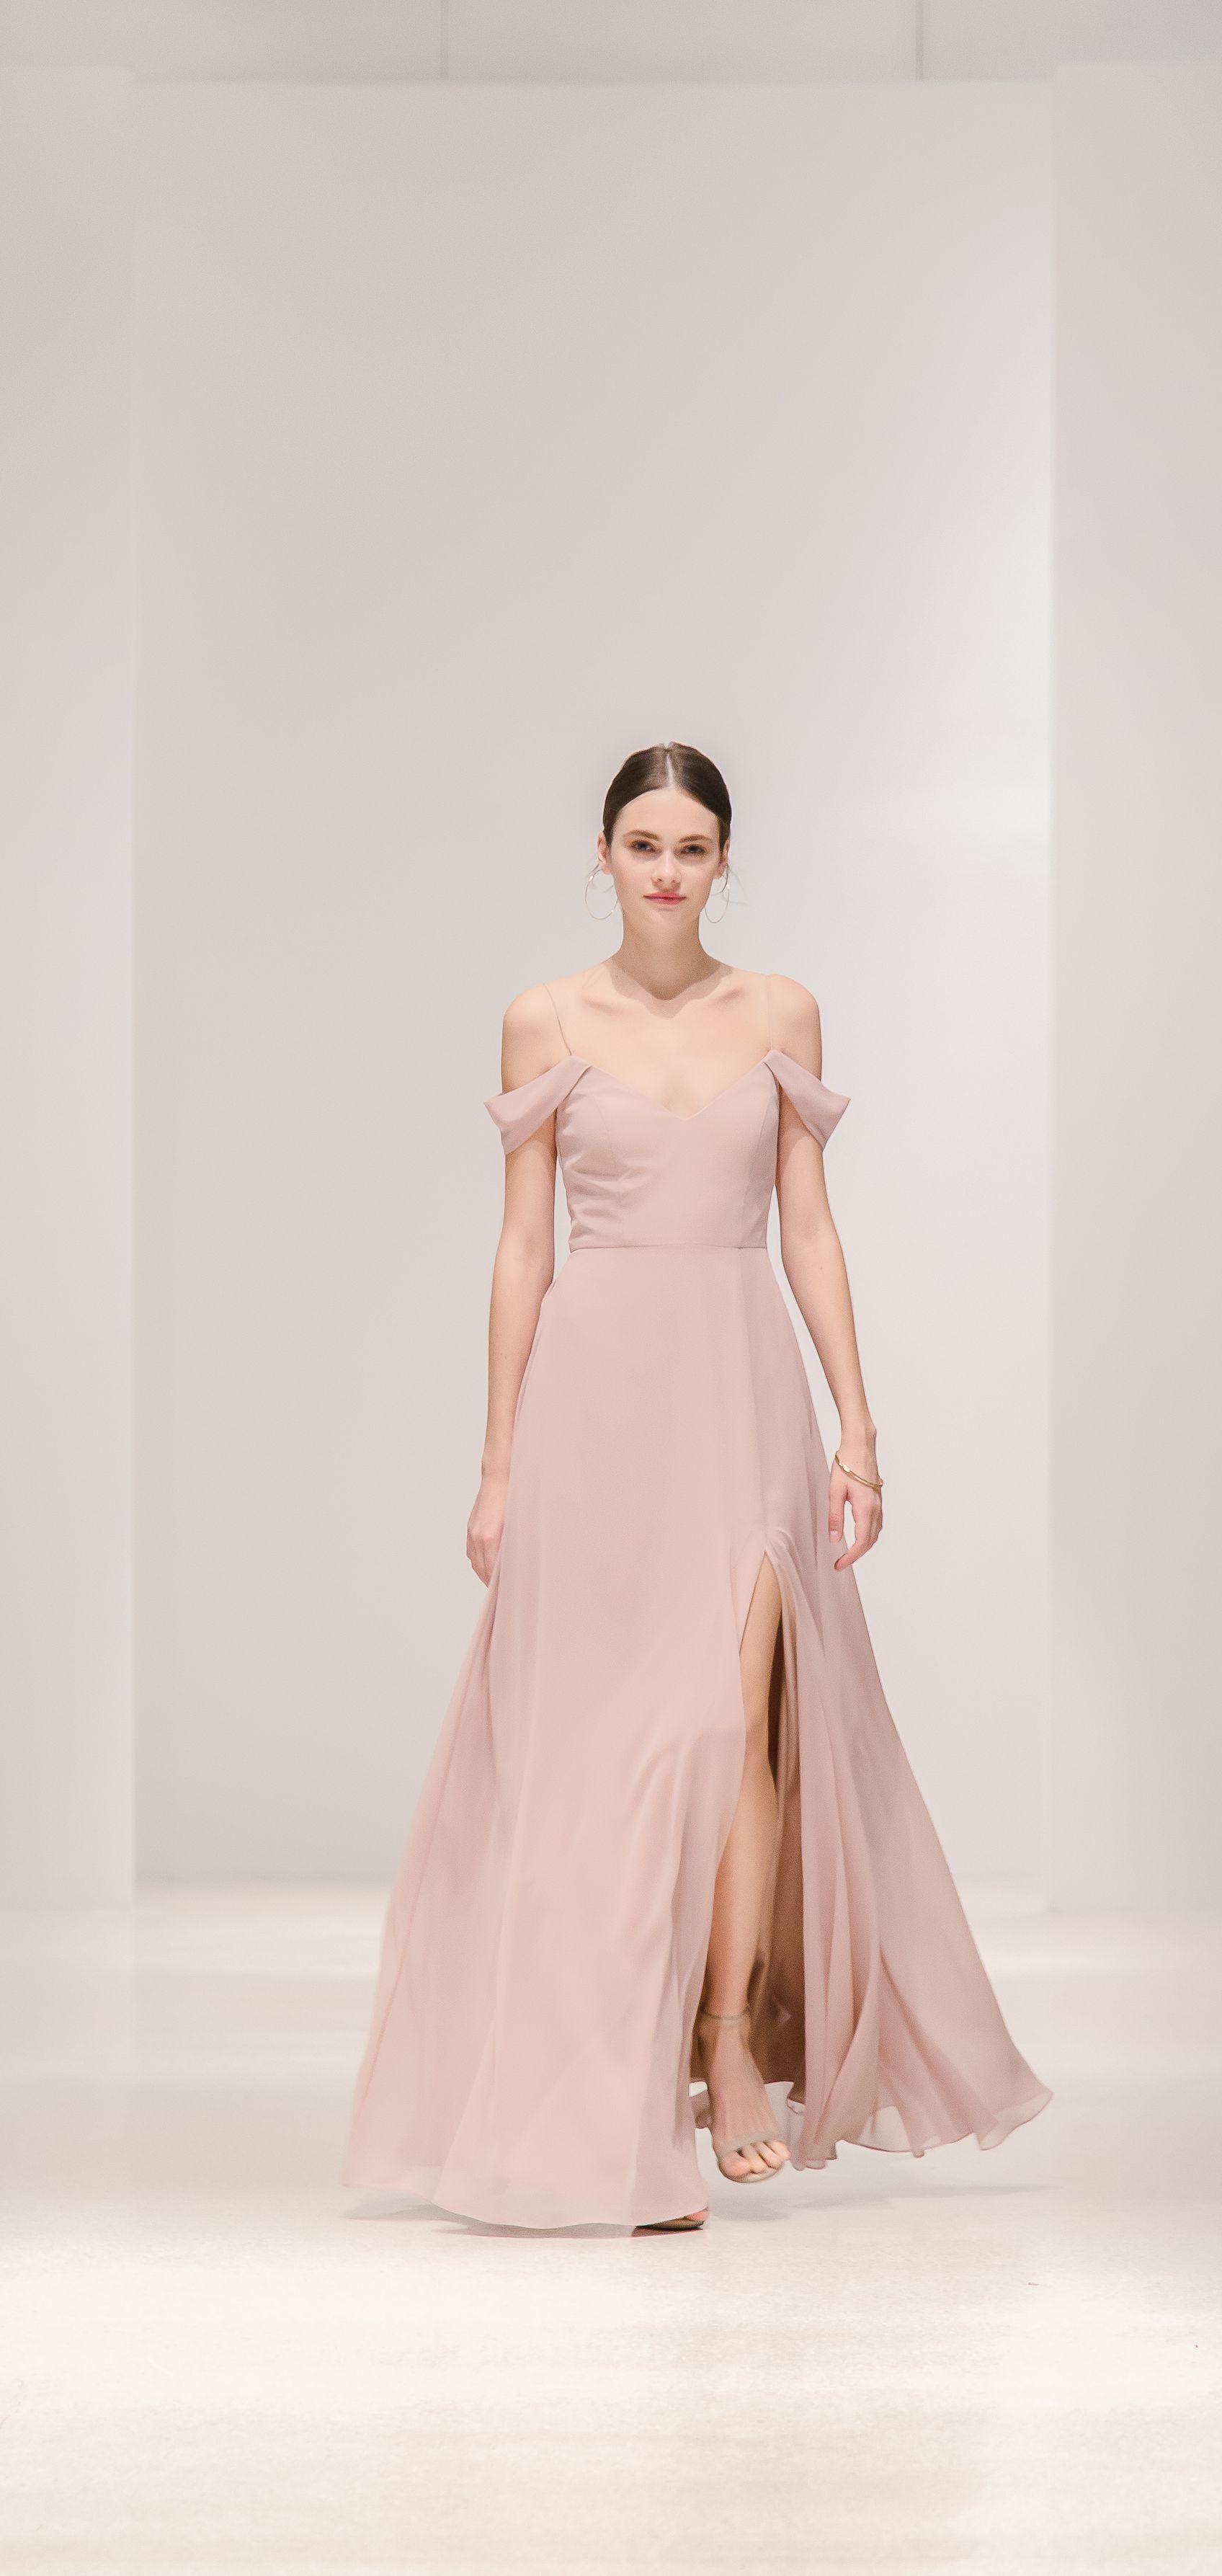 7de9a4fbd264 The Priya dress by Jenny Yoo Spring 2019 has a flattering soft A line  silhouette with a spaghetti strap V neckline in our flowy Chiffon. A modern off  the ...